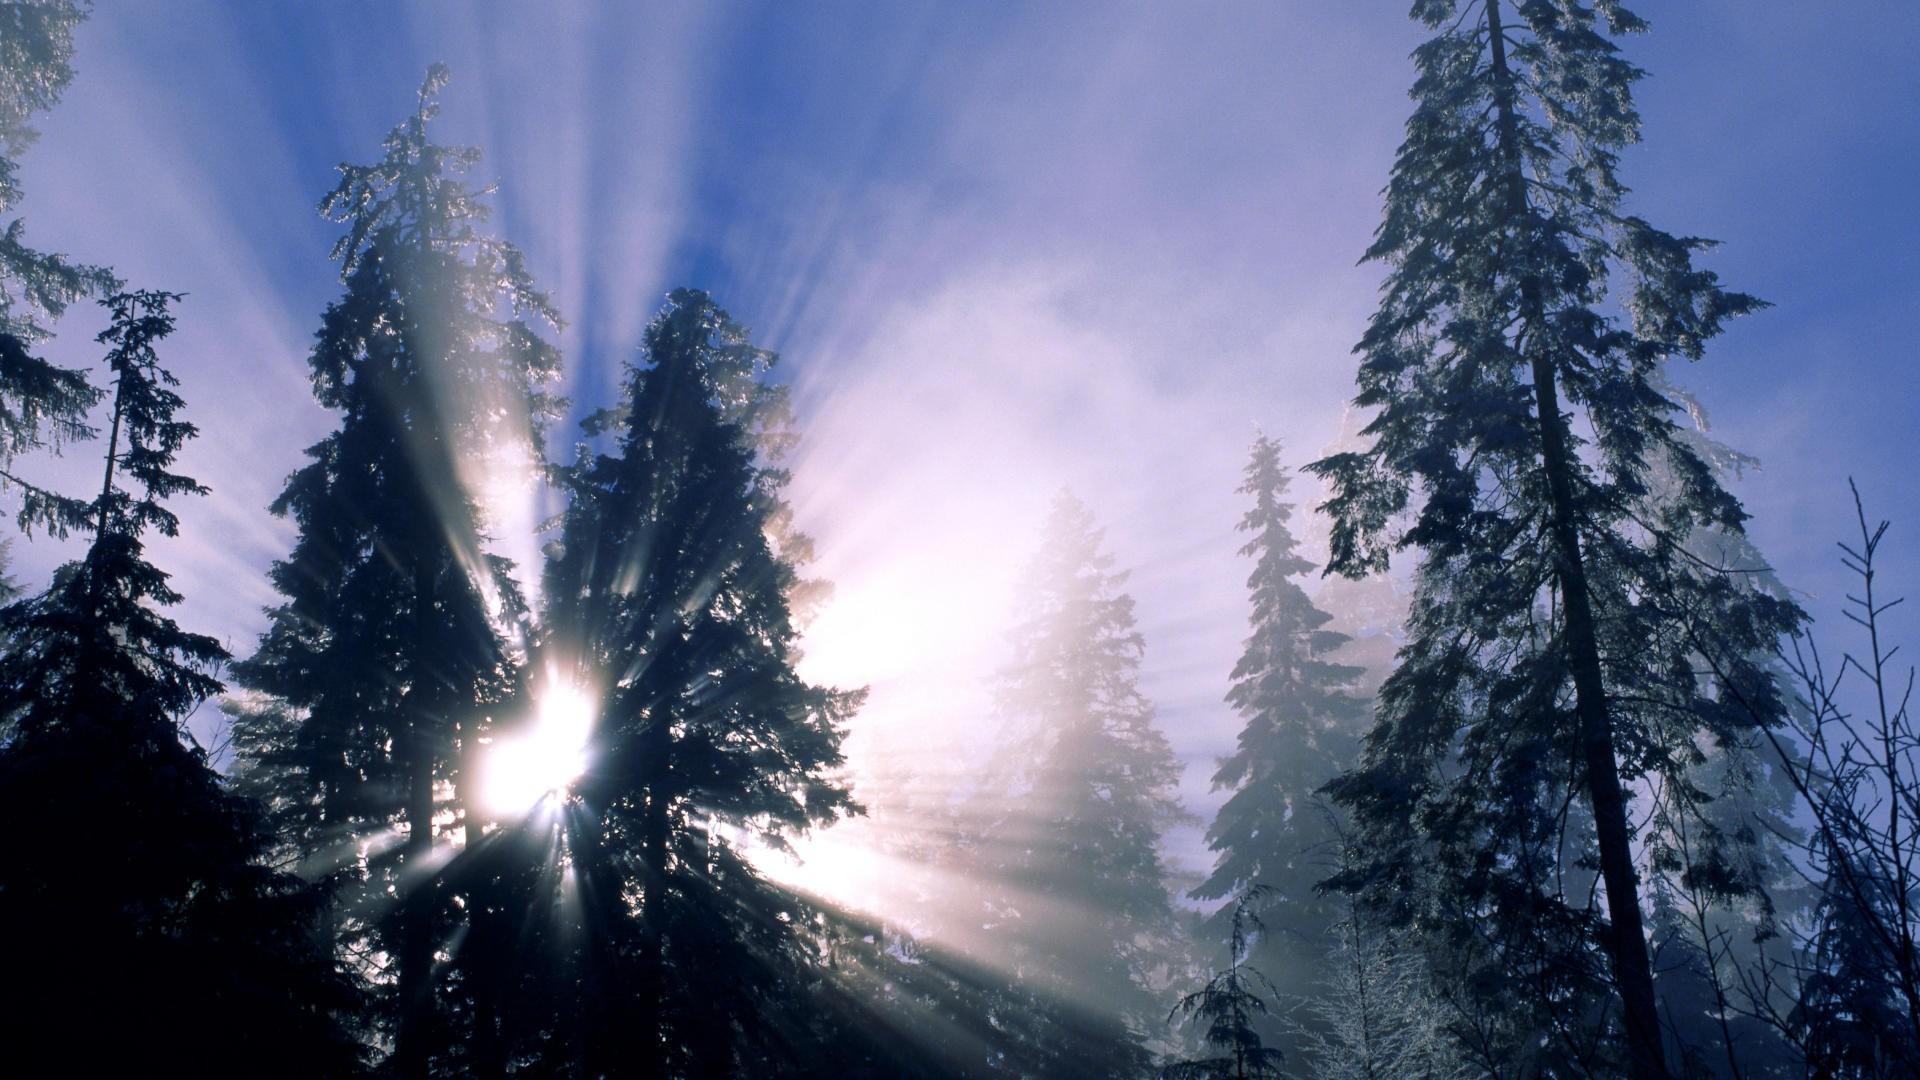 forest wallpaper love snow